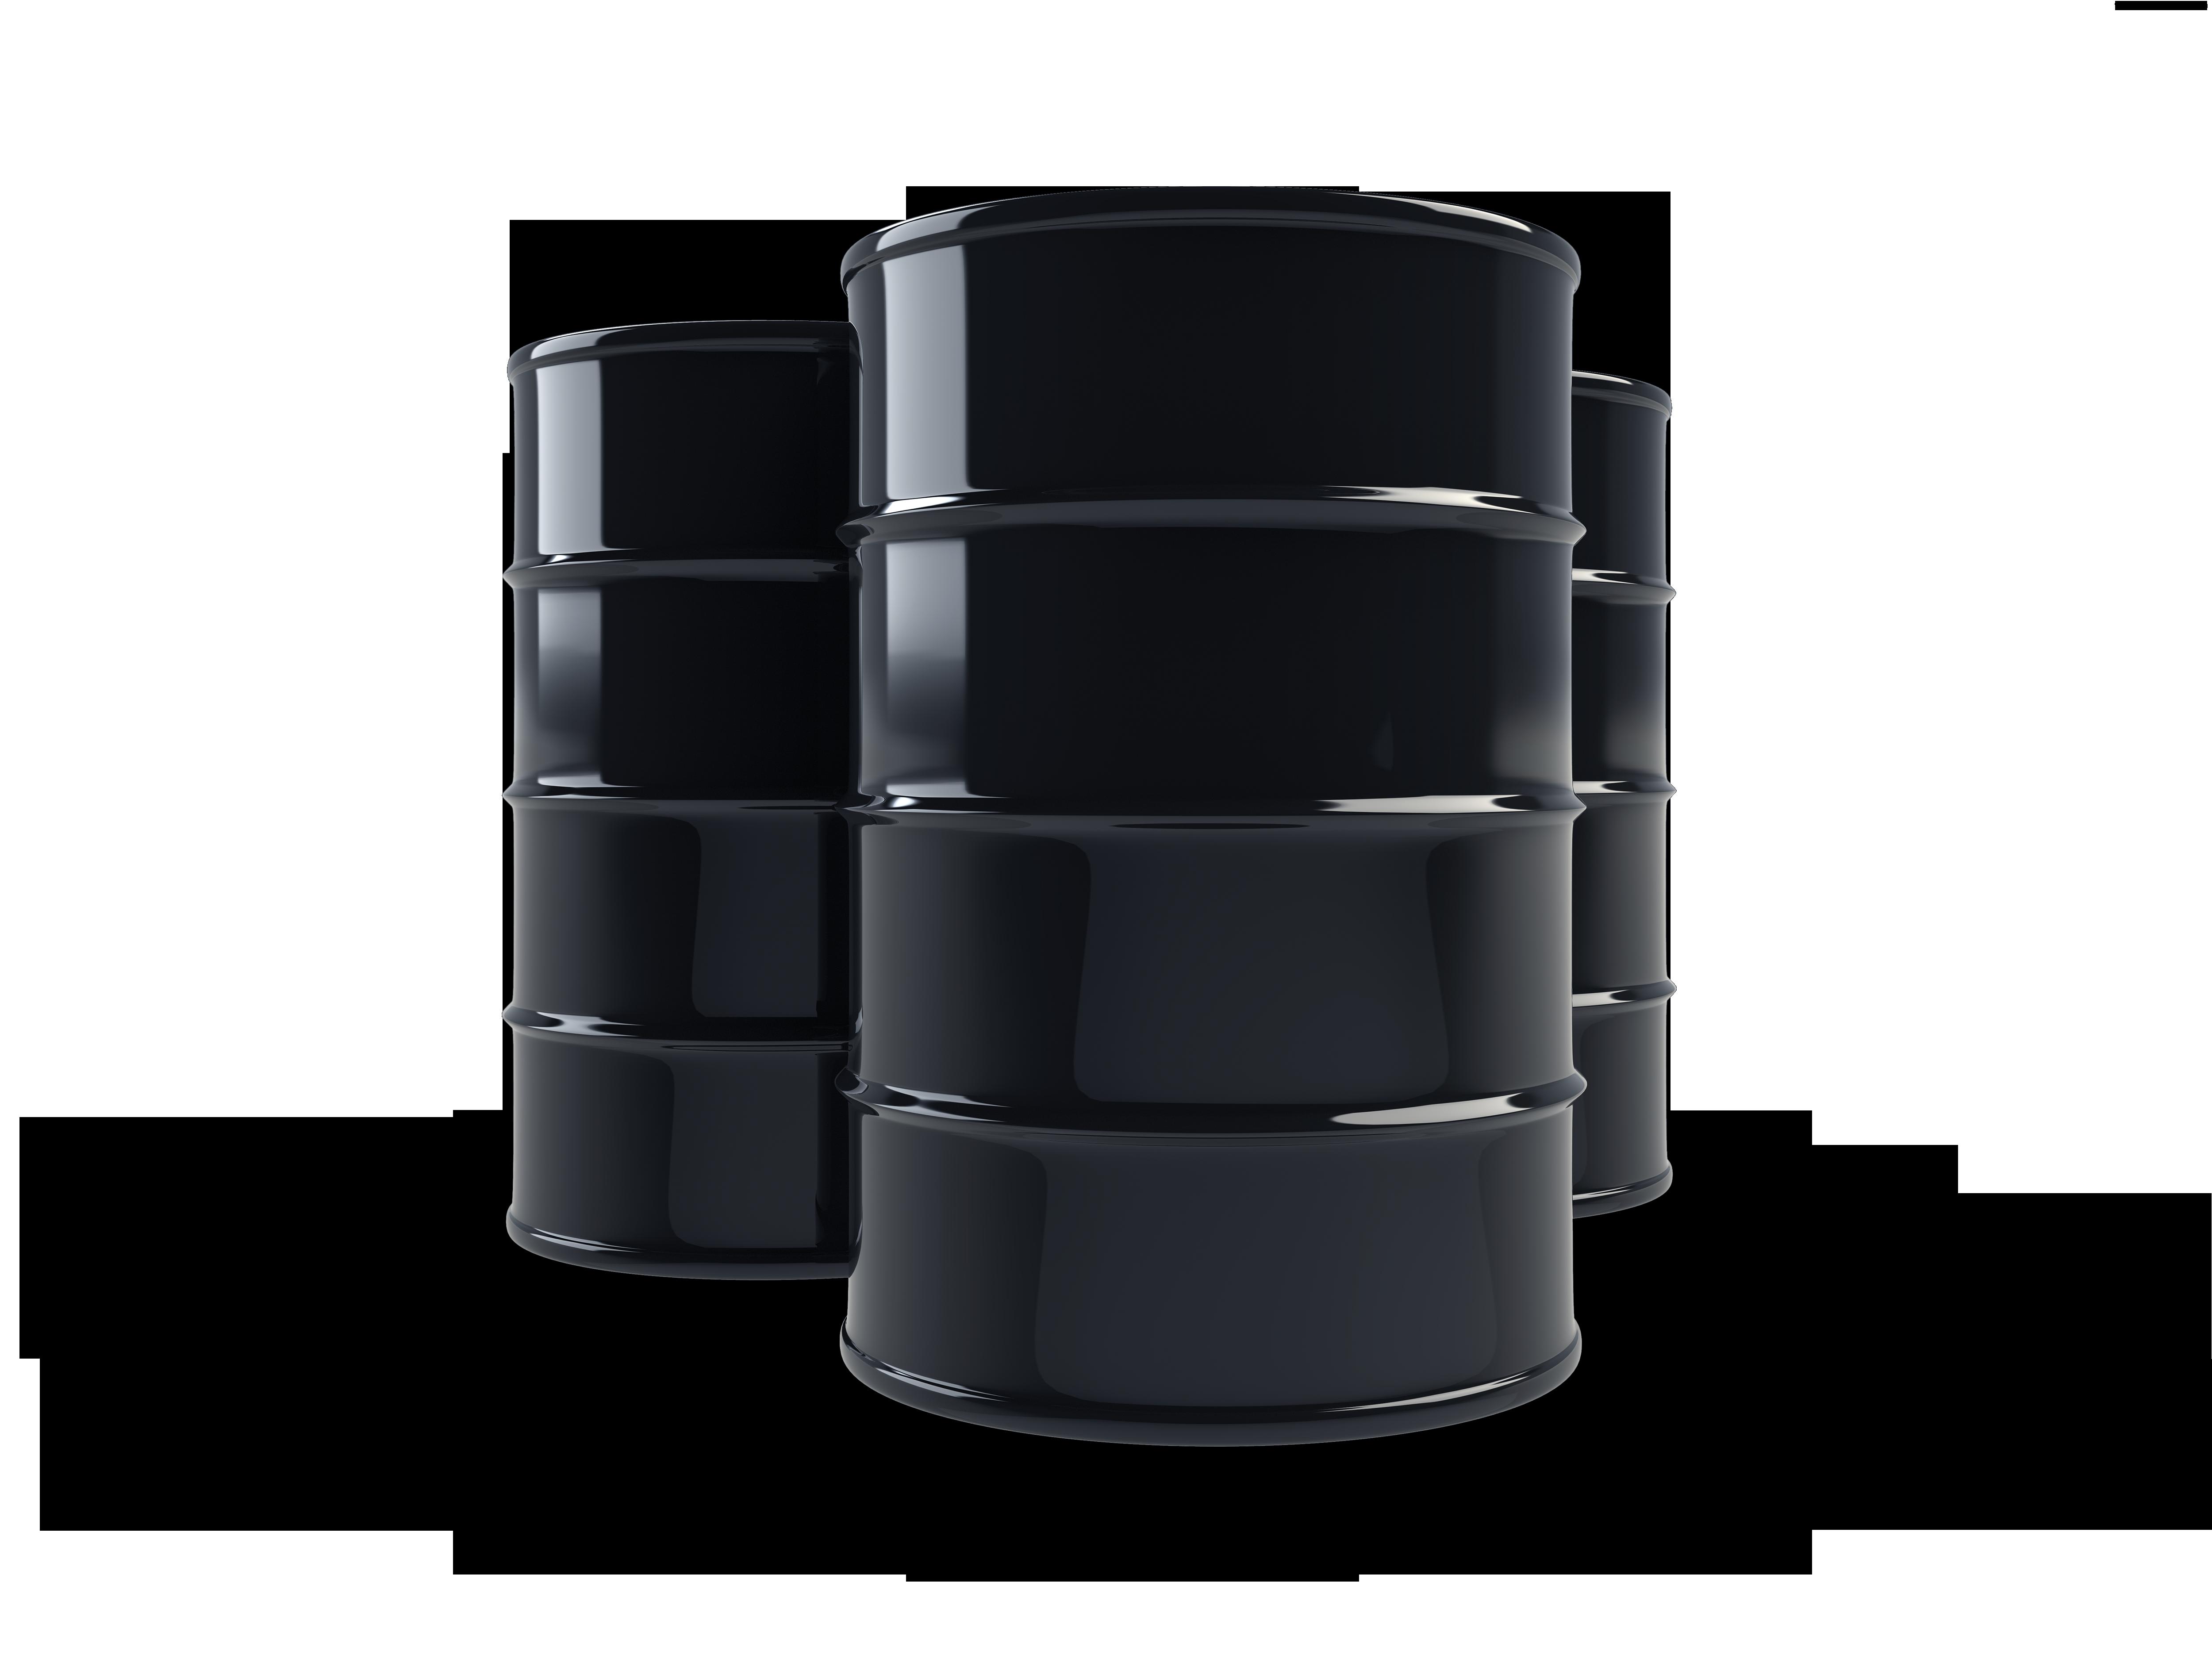 Oil clipart crude oil. Barrel png transparent images